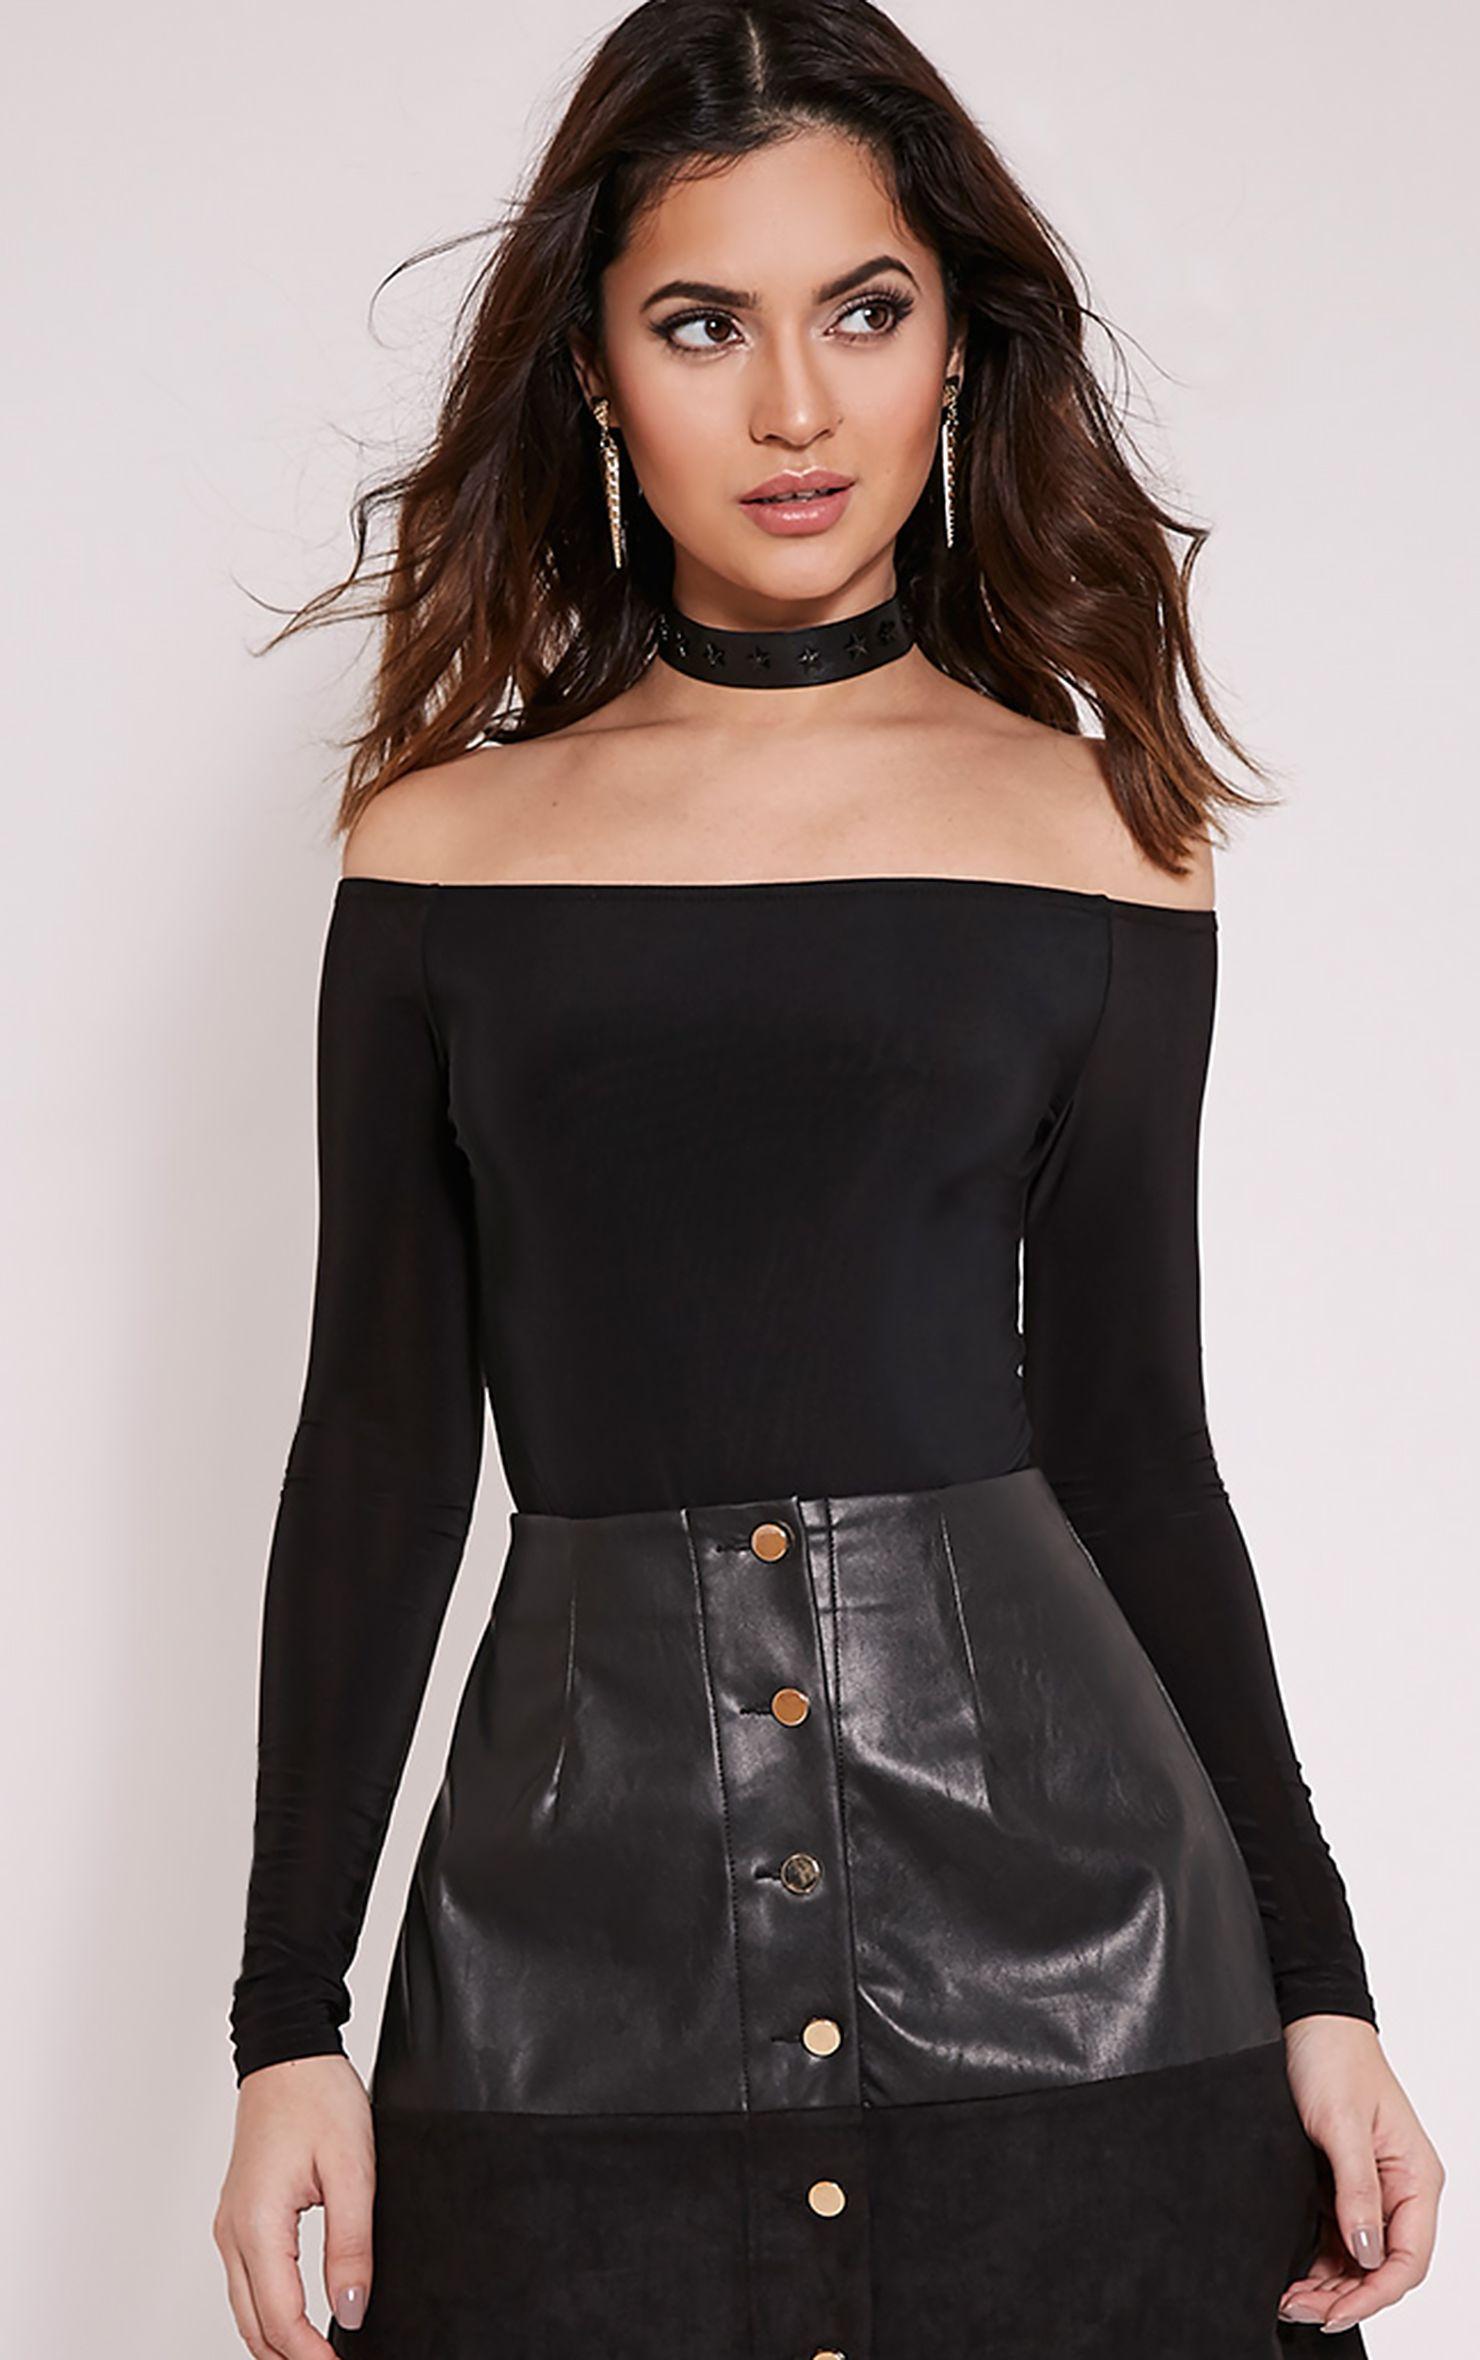 Rossalyn Black Slinky Bardot Bodysuit